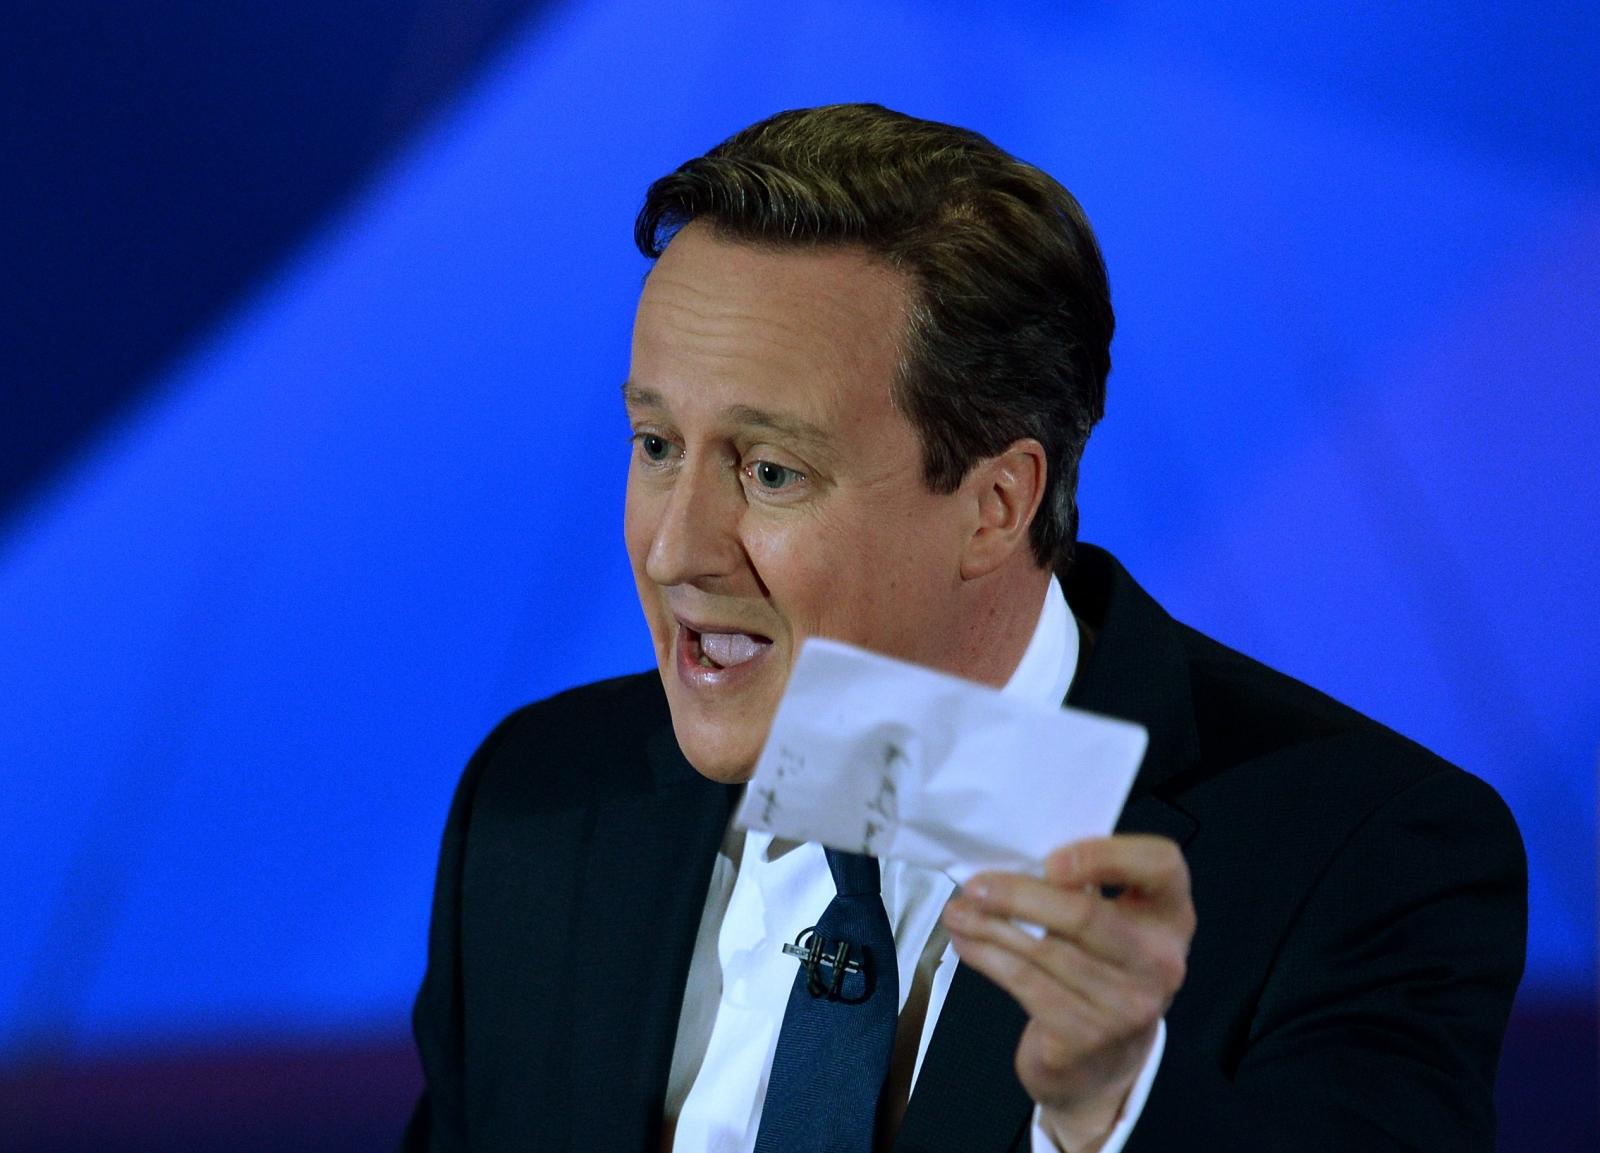 David Cameron Conservative